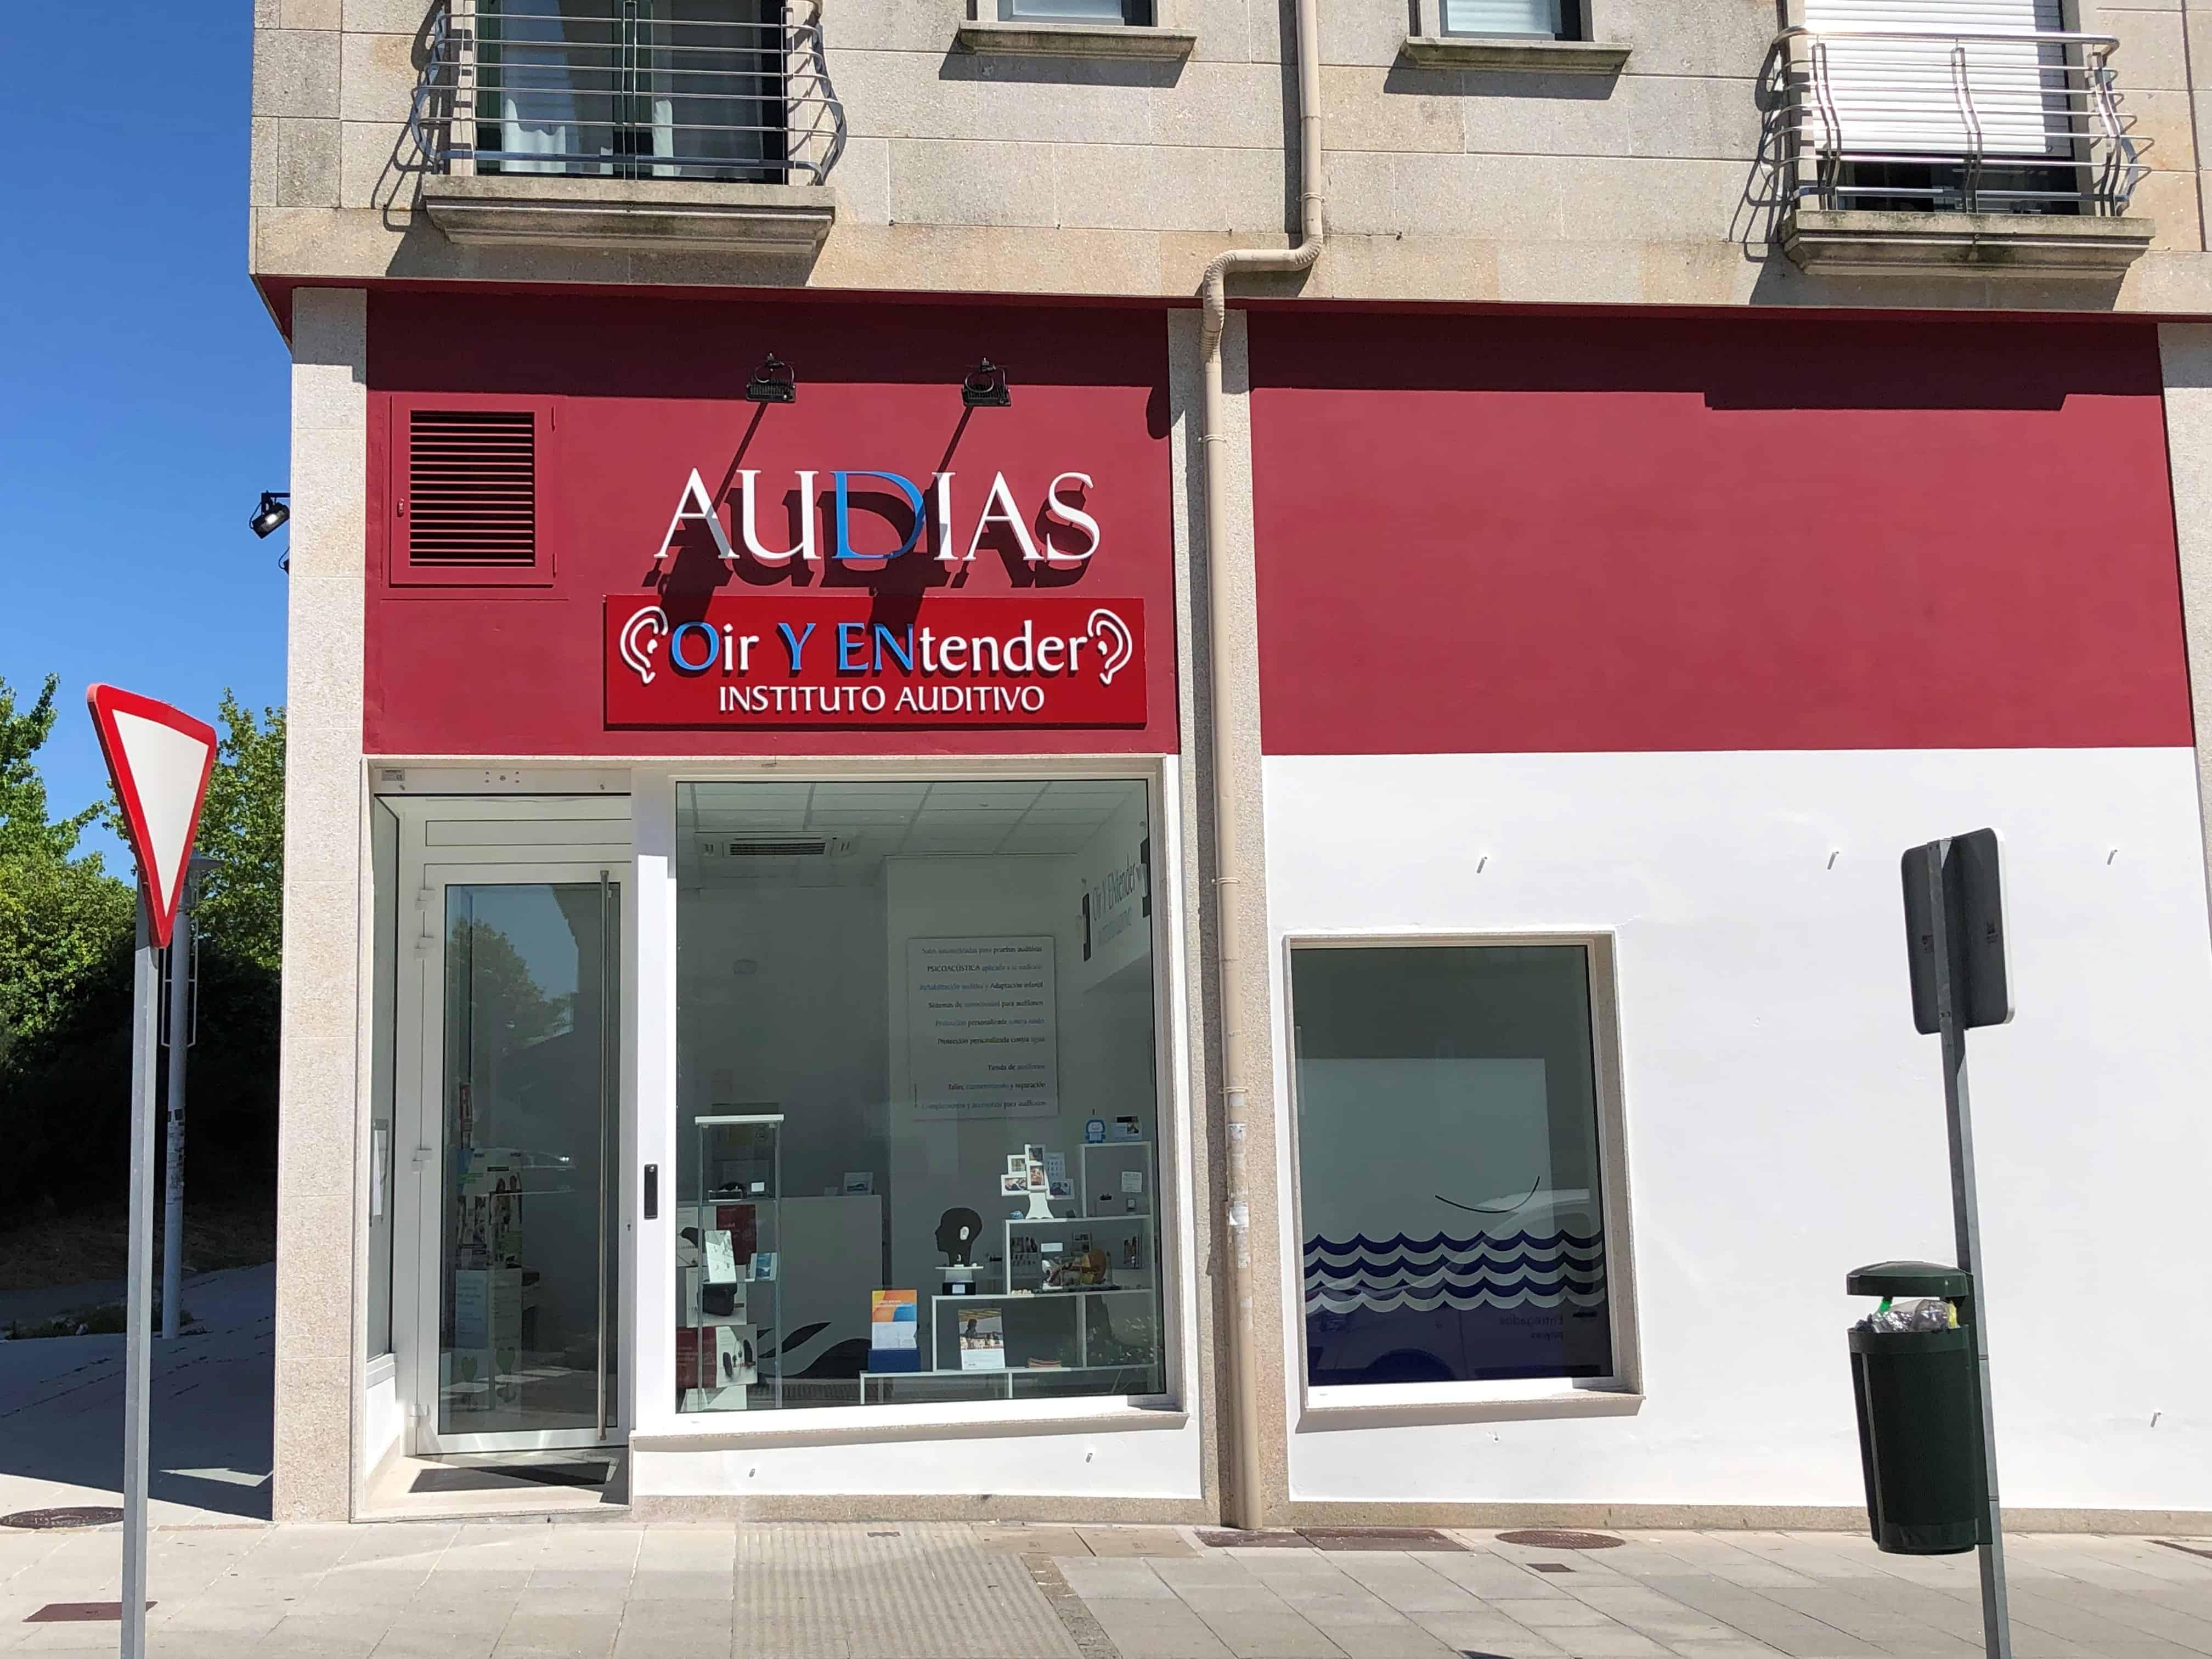 Audias Santiago de Compostela